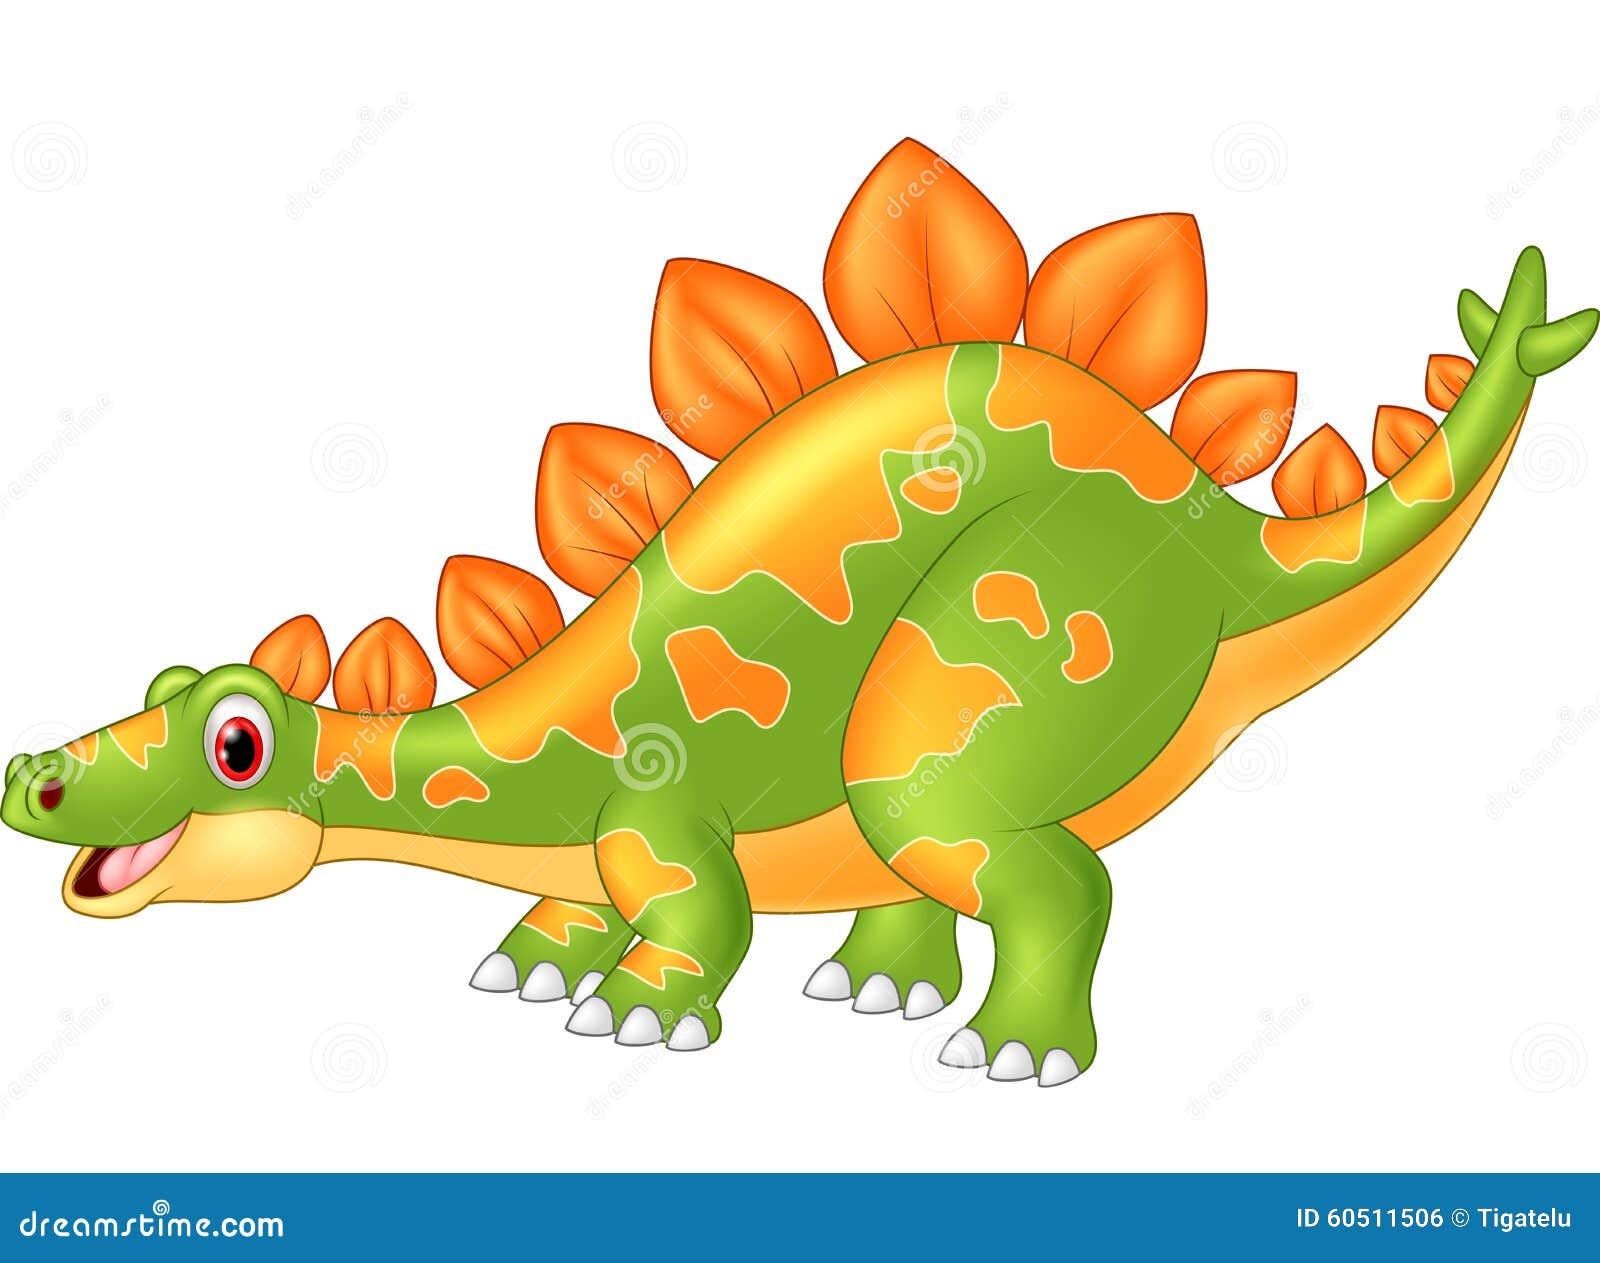 Cartoon Big Dinosaur Stegosaurus Stock Illustration - Image: 60511506